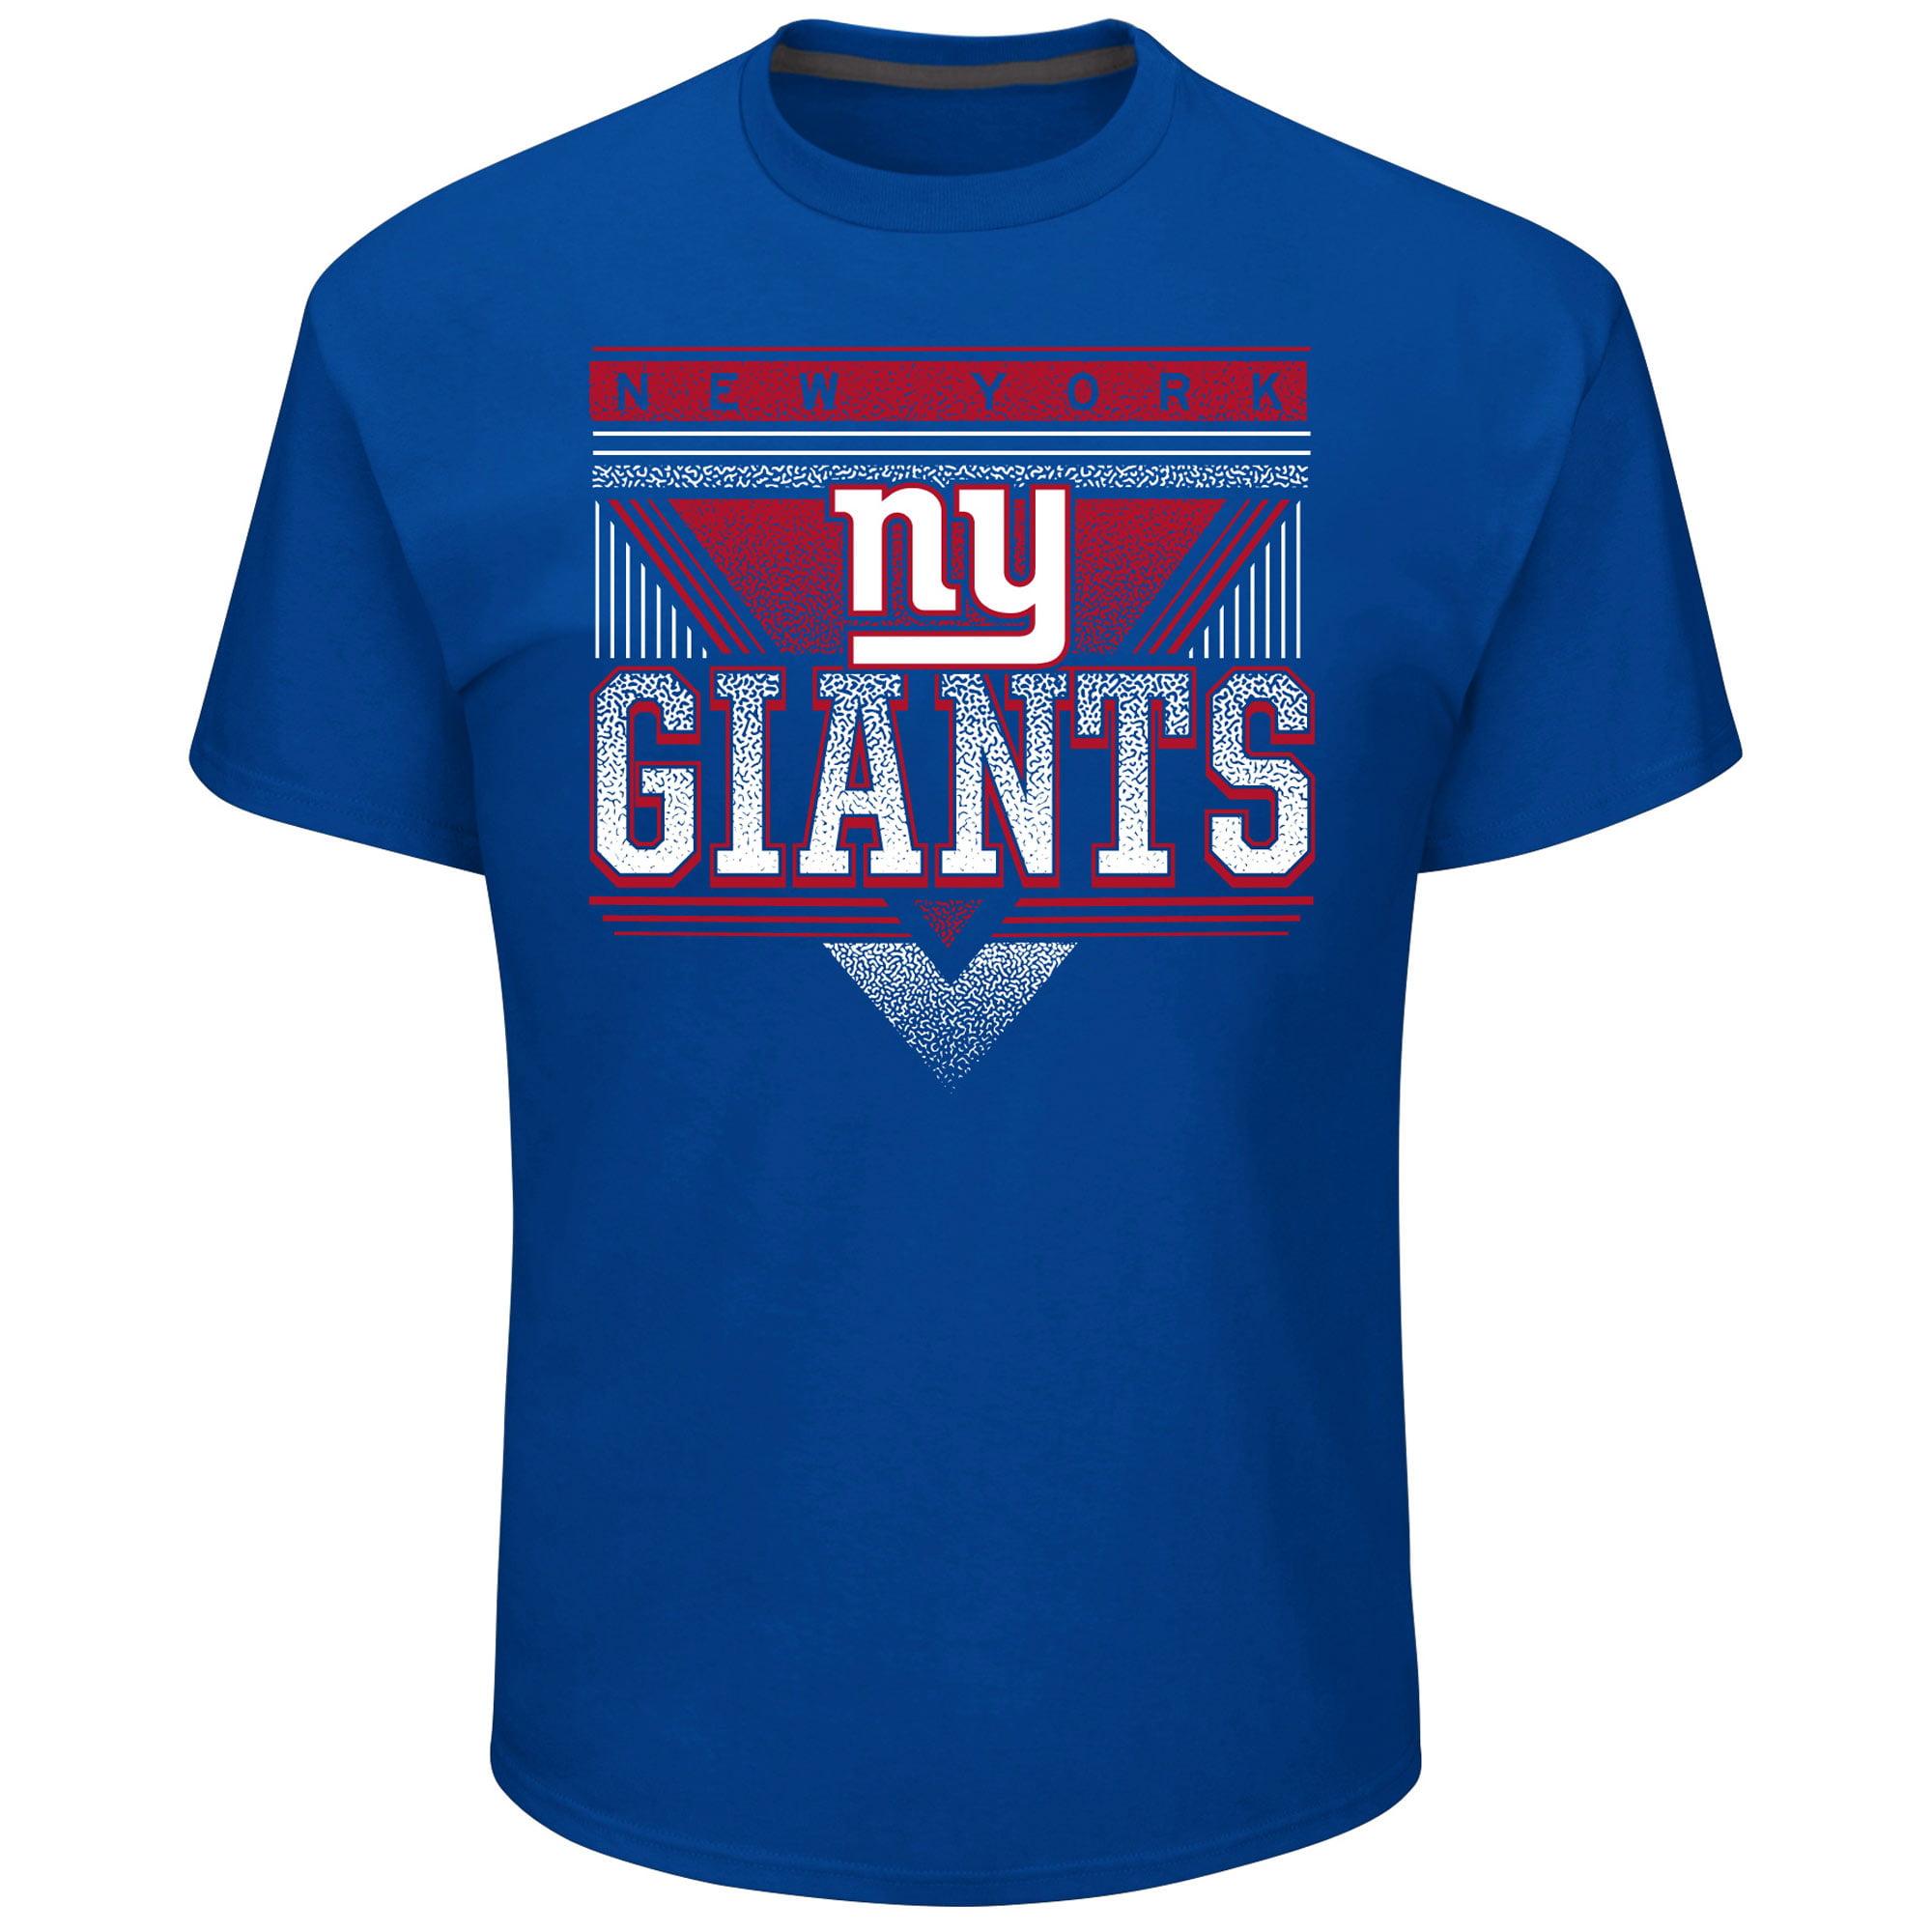 New York Giants Majestic Keep Score T-Shirt - Royal